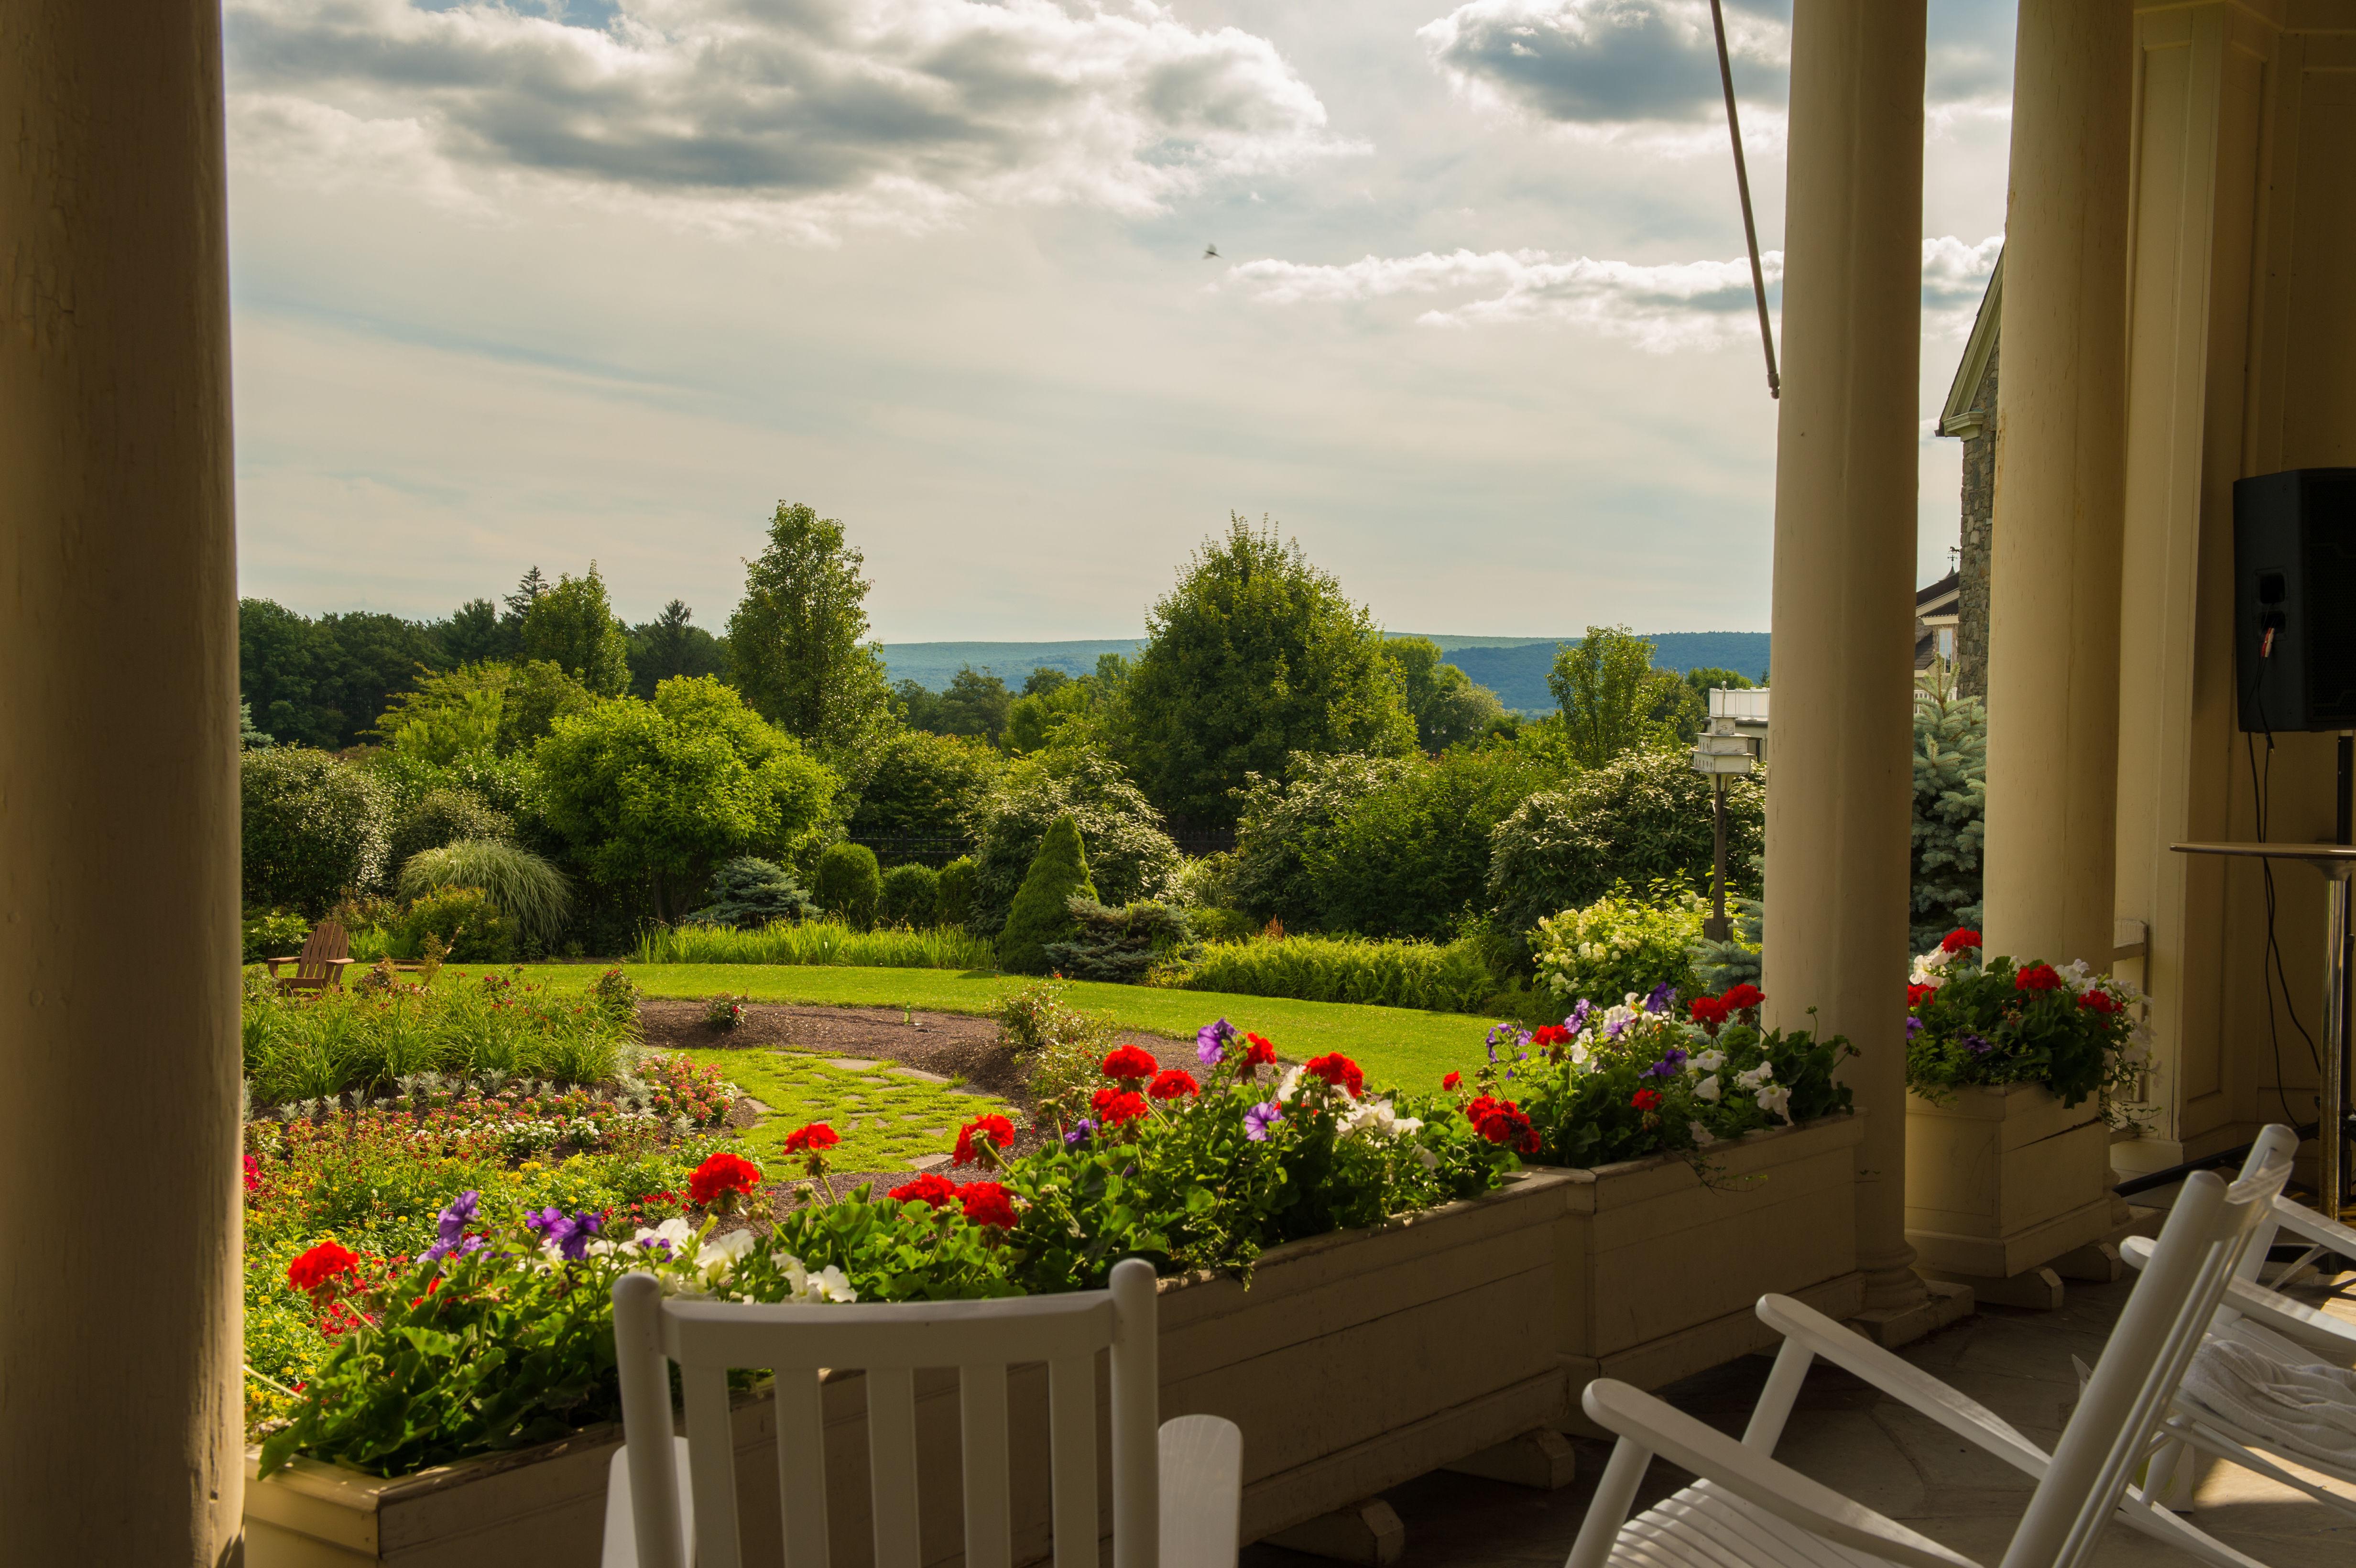 Resort Garden at Skytop Lodge